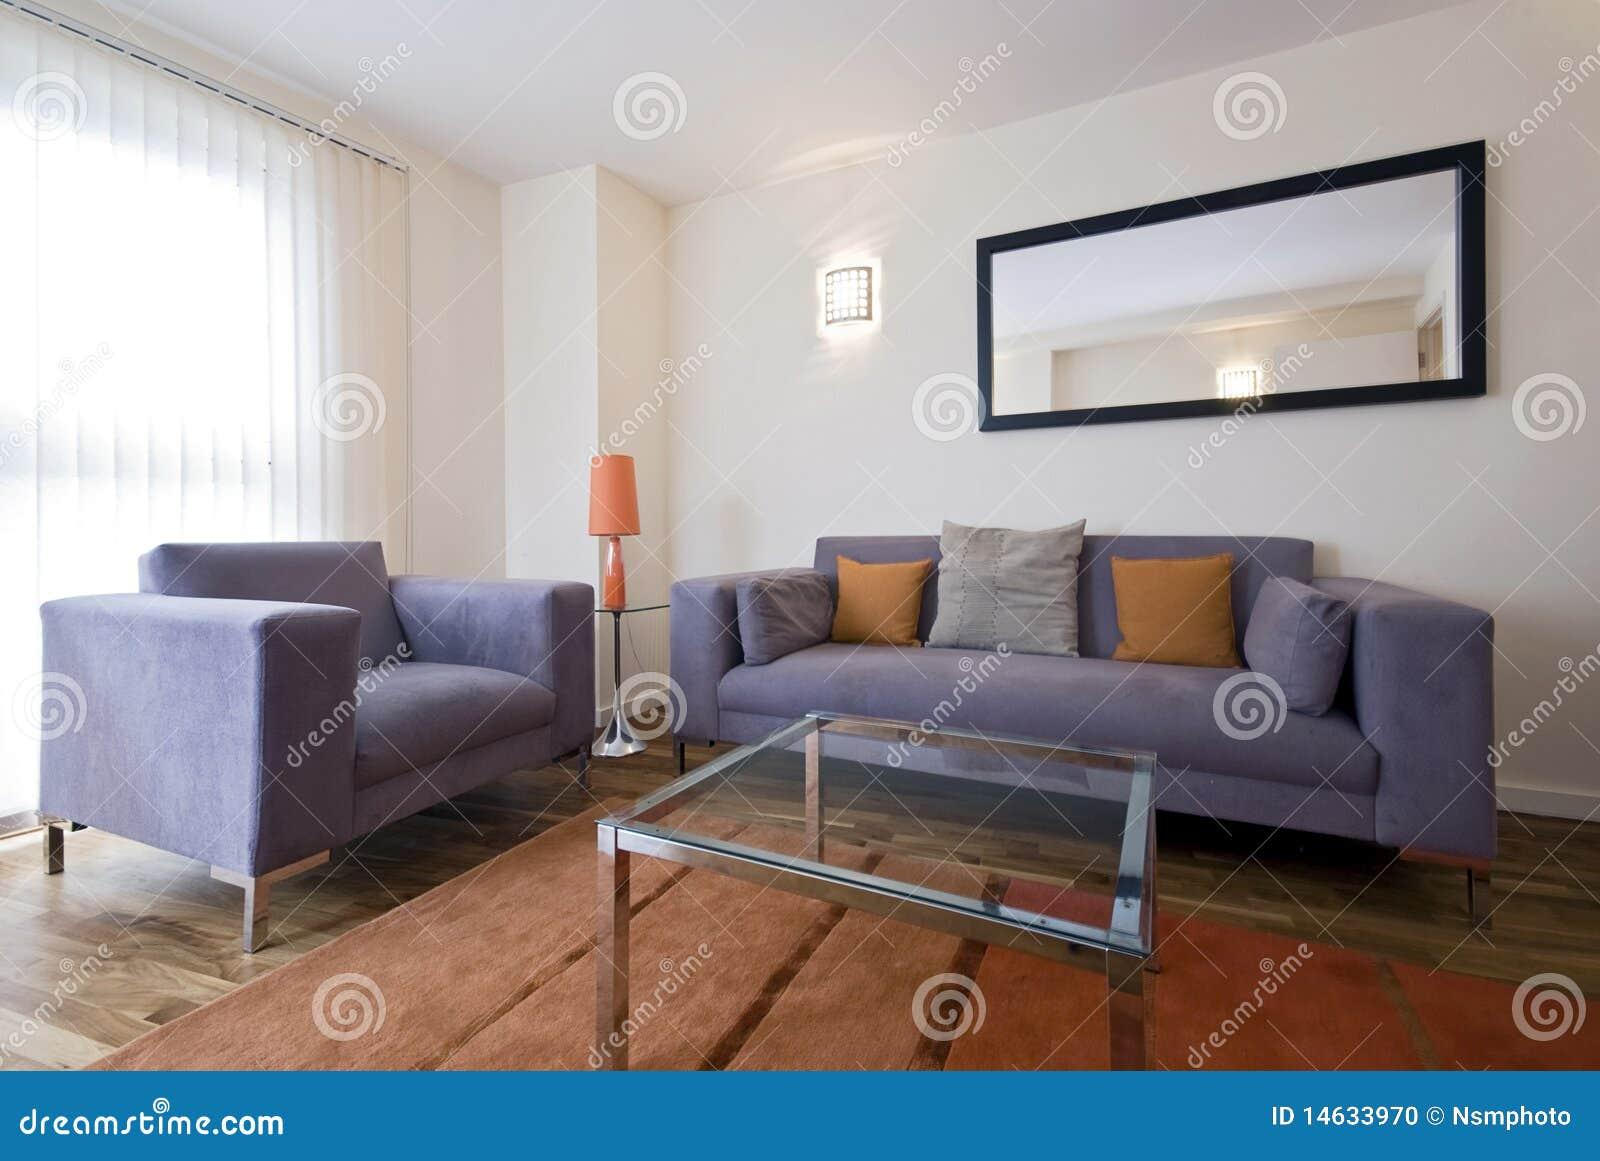 Woonkamer Grijze Bank : Modern en minimalistisch interieur van woonkamer gezellige kamer